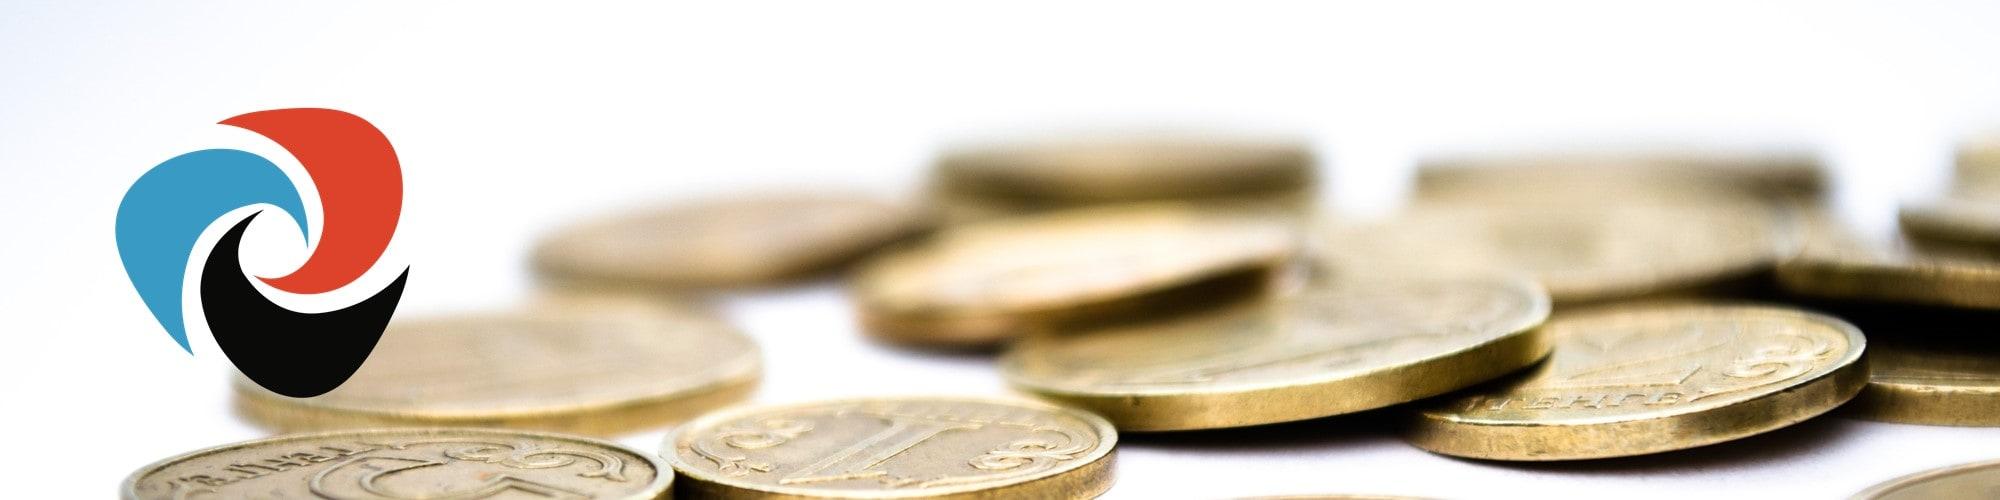 save money in mont albert